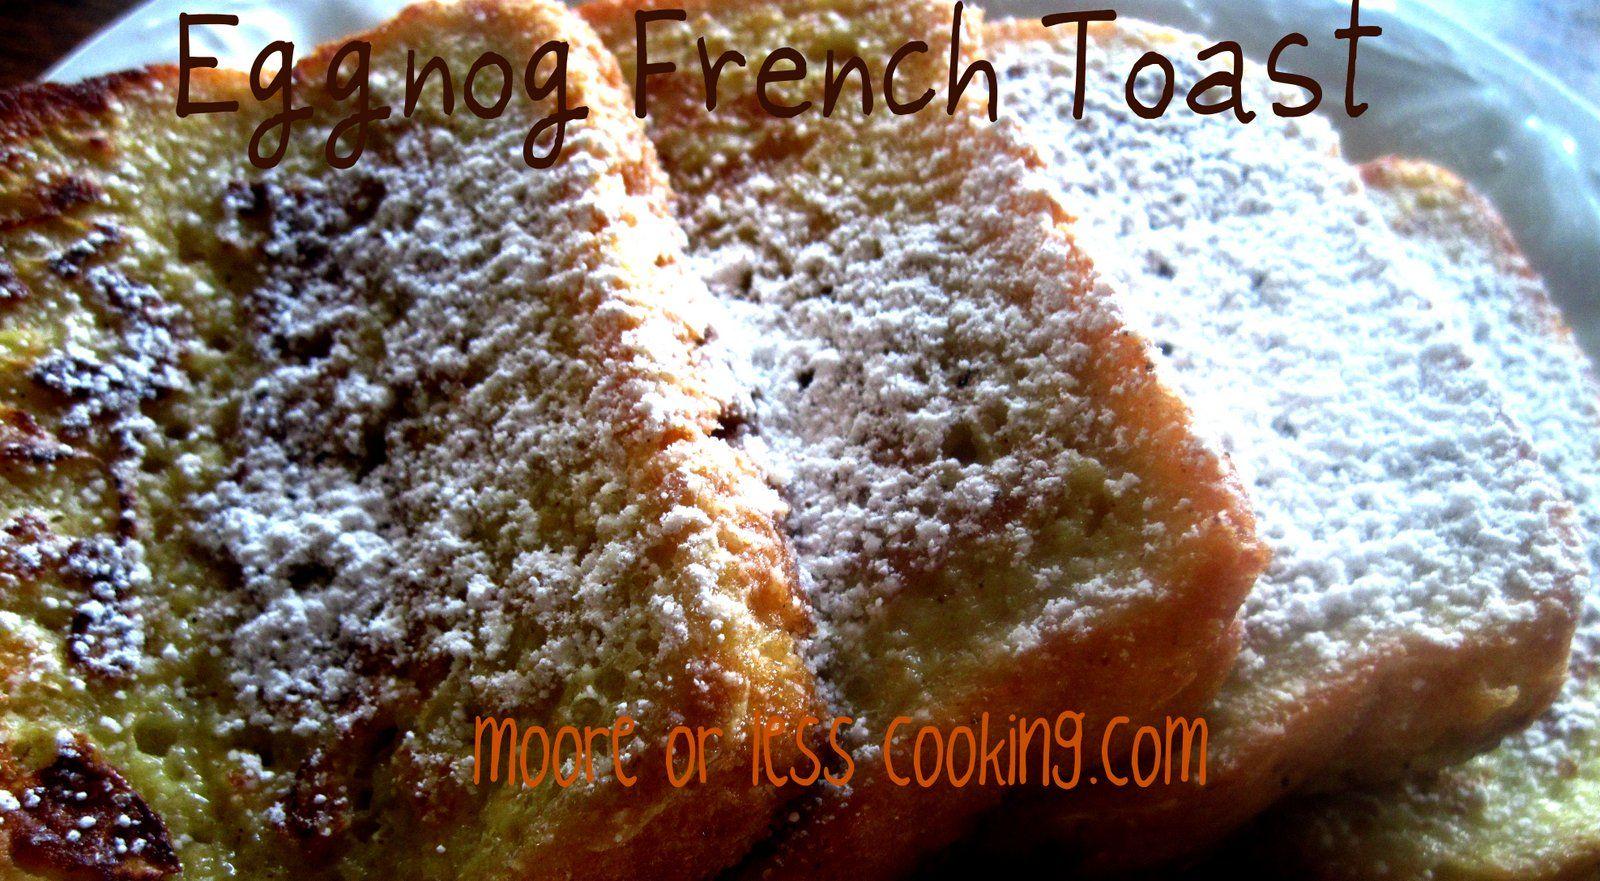 Eggnog french toast eggnog french toast easy cooking